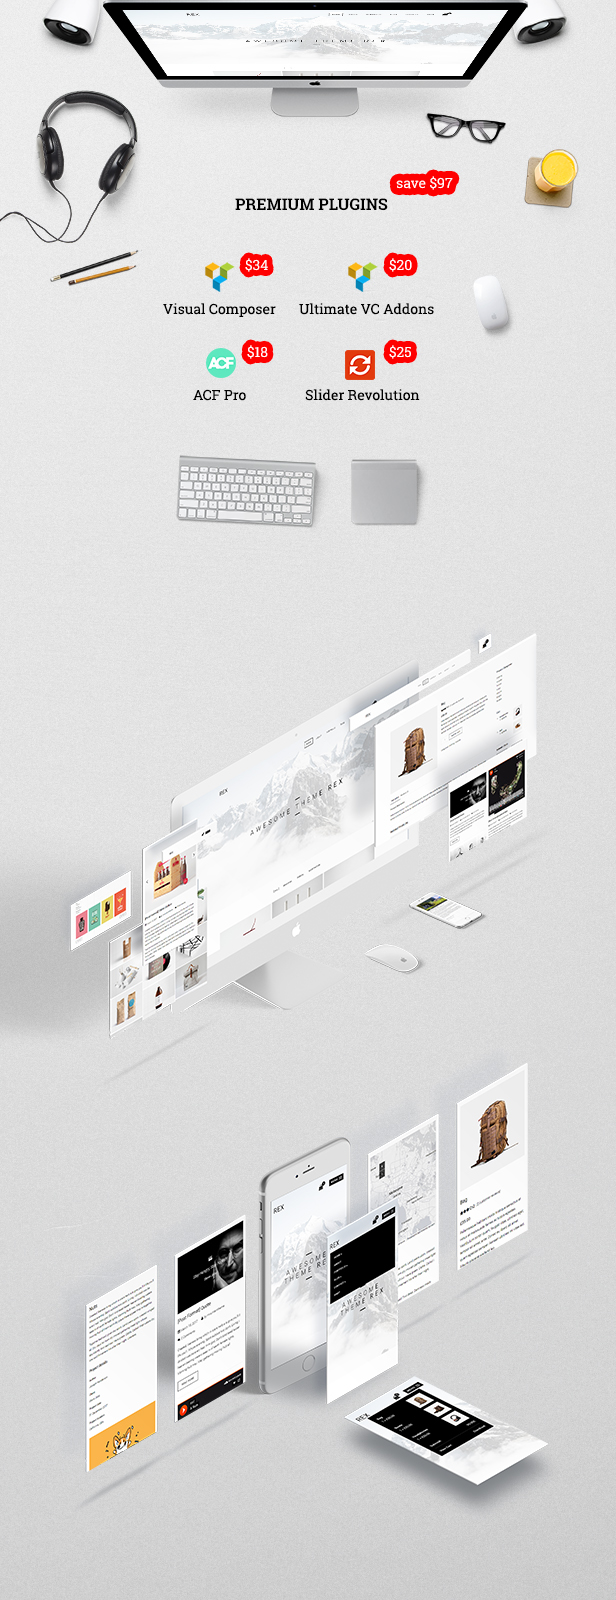 Rex - Minimales WordPress-Portfolio-Design - 1